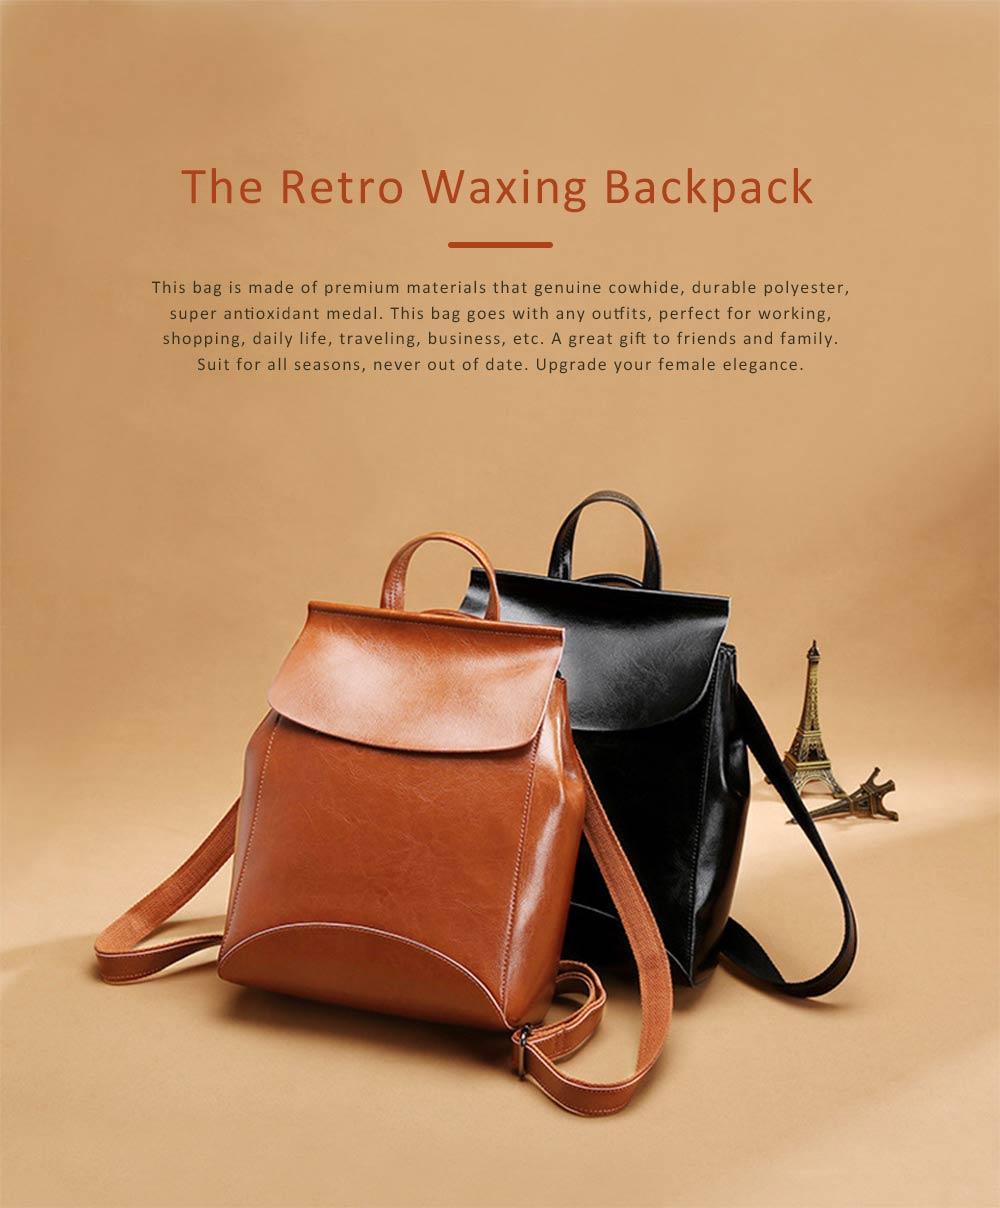 Retro Waxing Double Layer Cowhide Rucksack Shoulder Bag Women Fashion Accessories Elegant Large Capacity Travel Bag 0